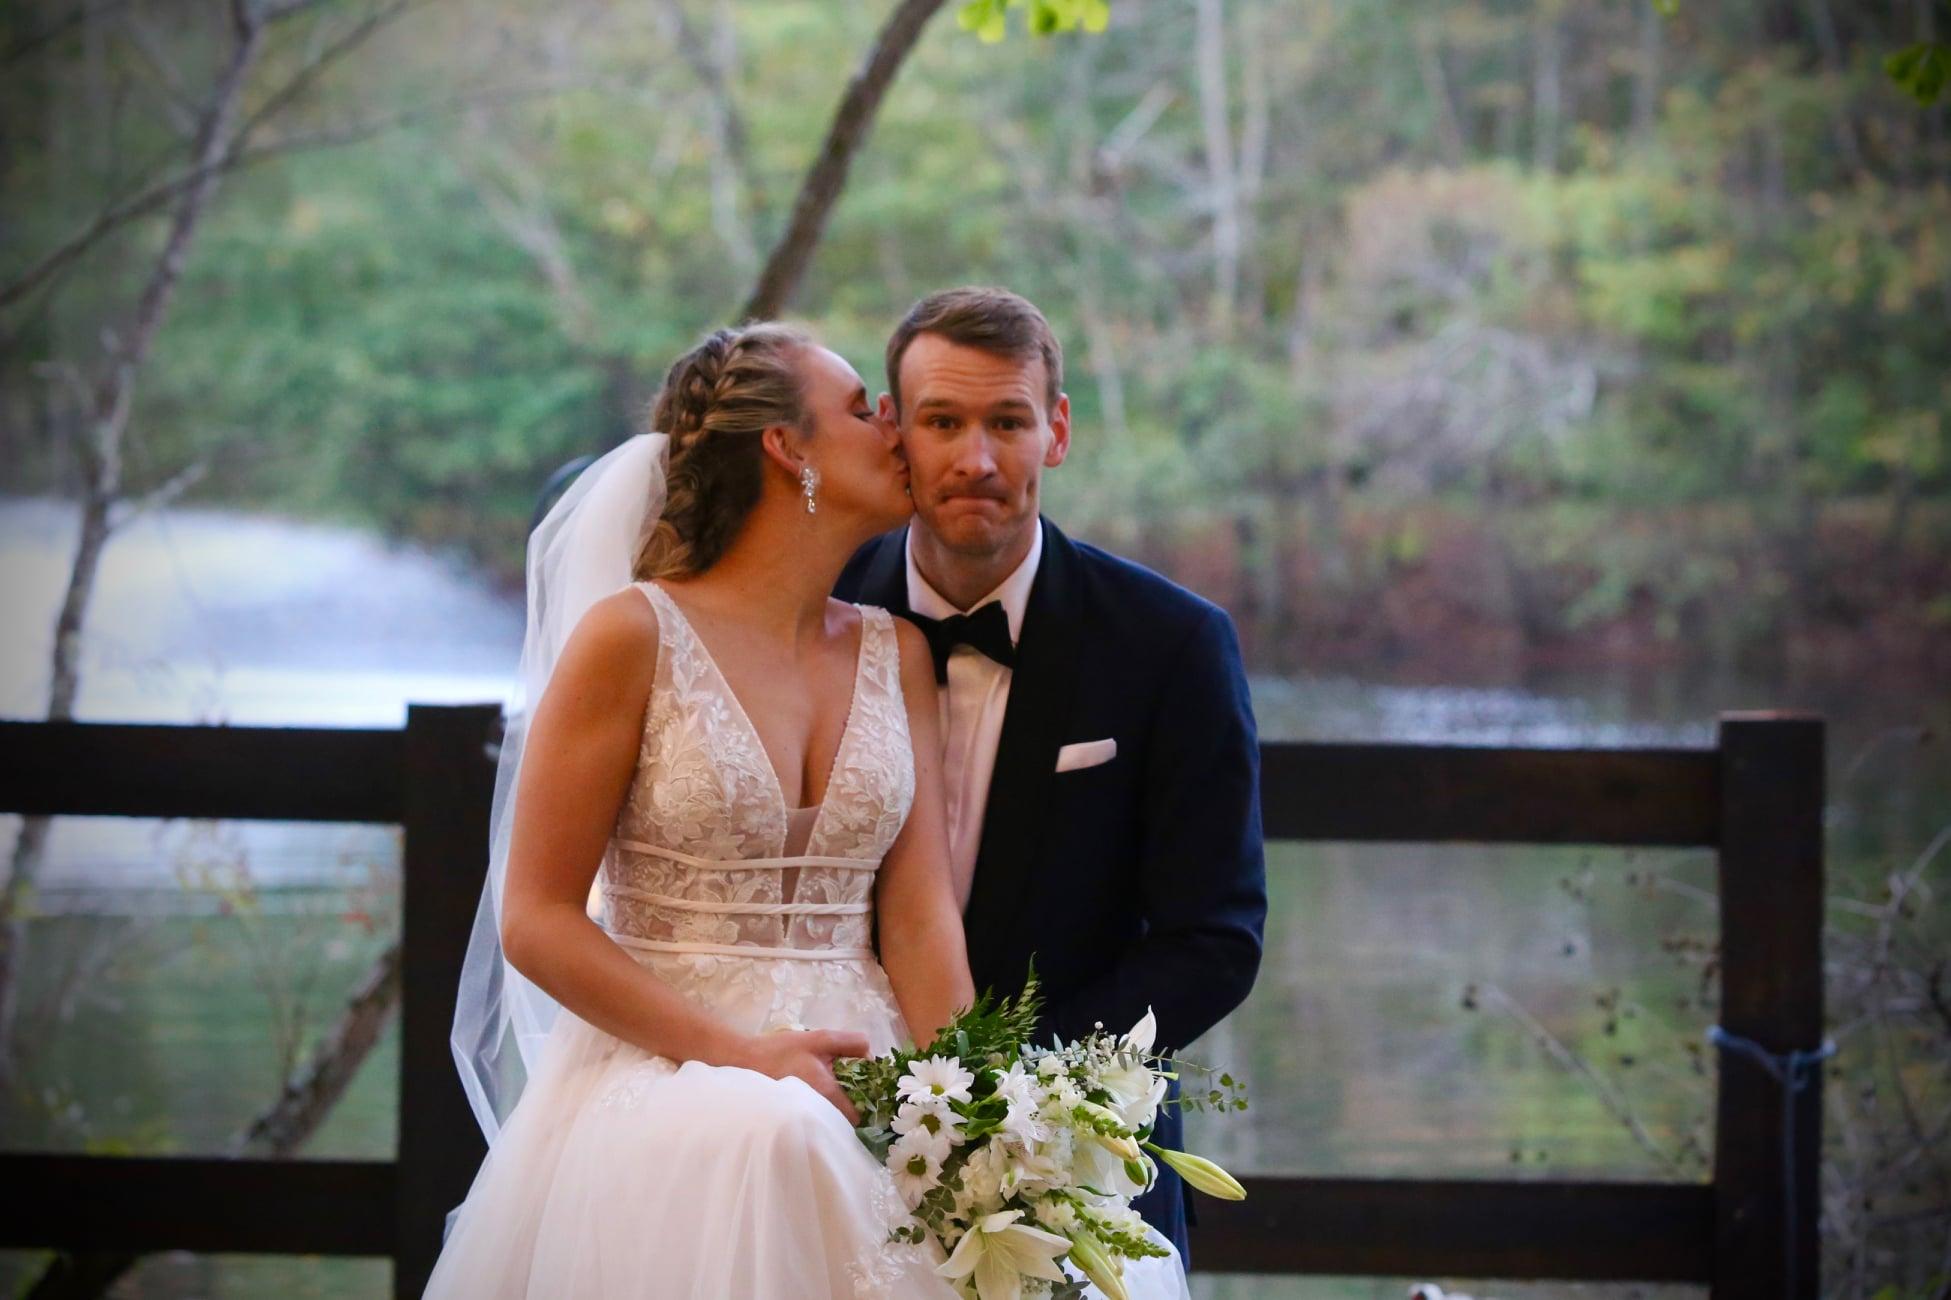 unique groom photo on wedding day with bride